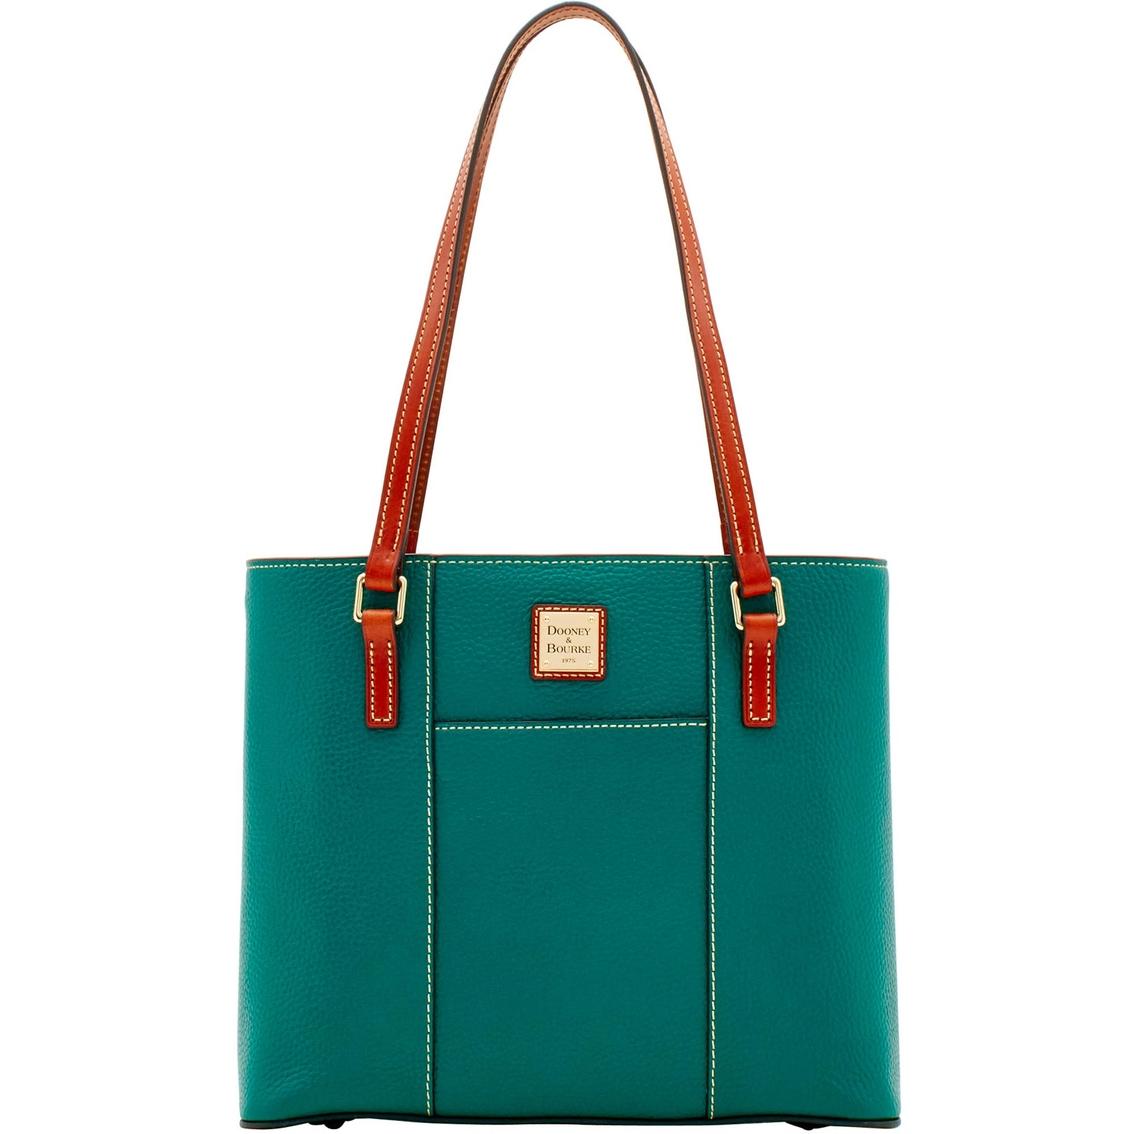 3dd138381ceb Dooney   Bourke Pebble Leather Small Lexington Shopper Handbag ...